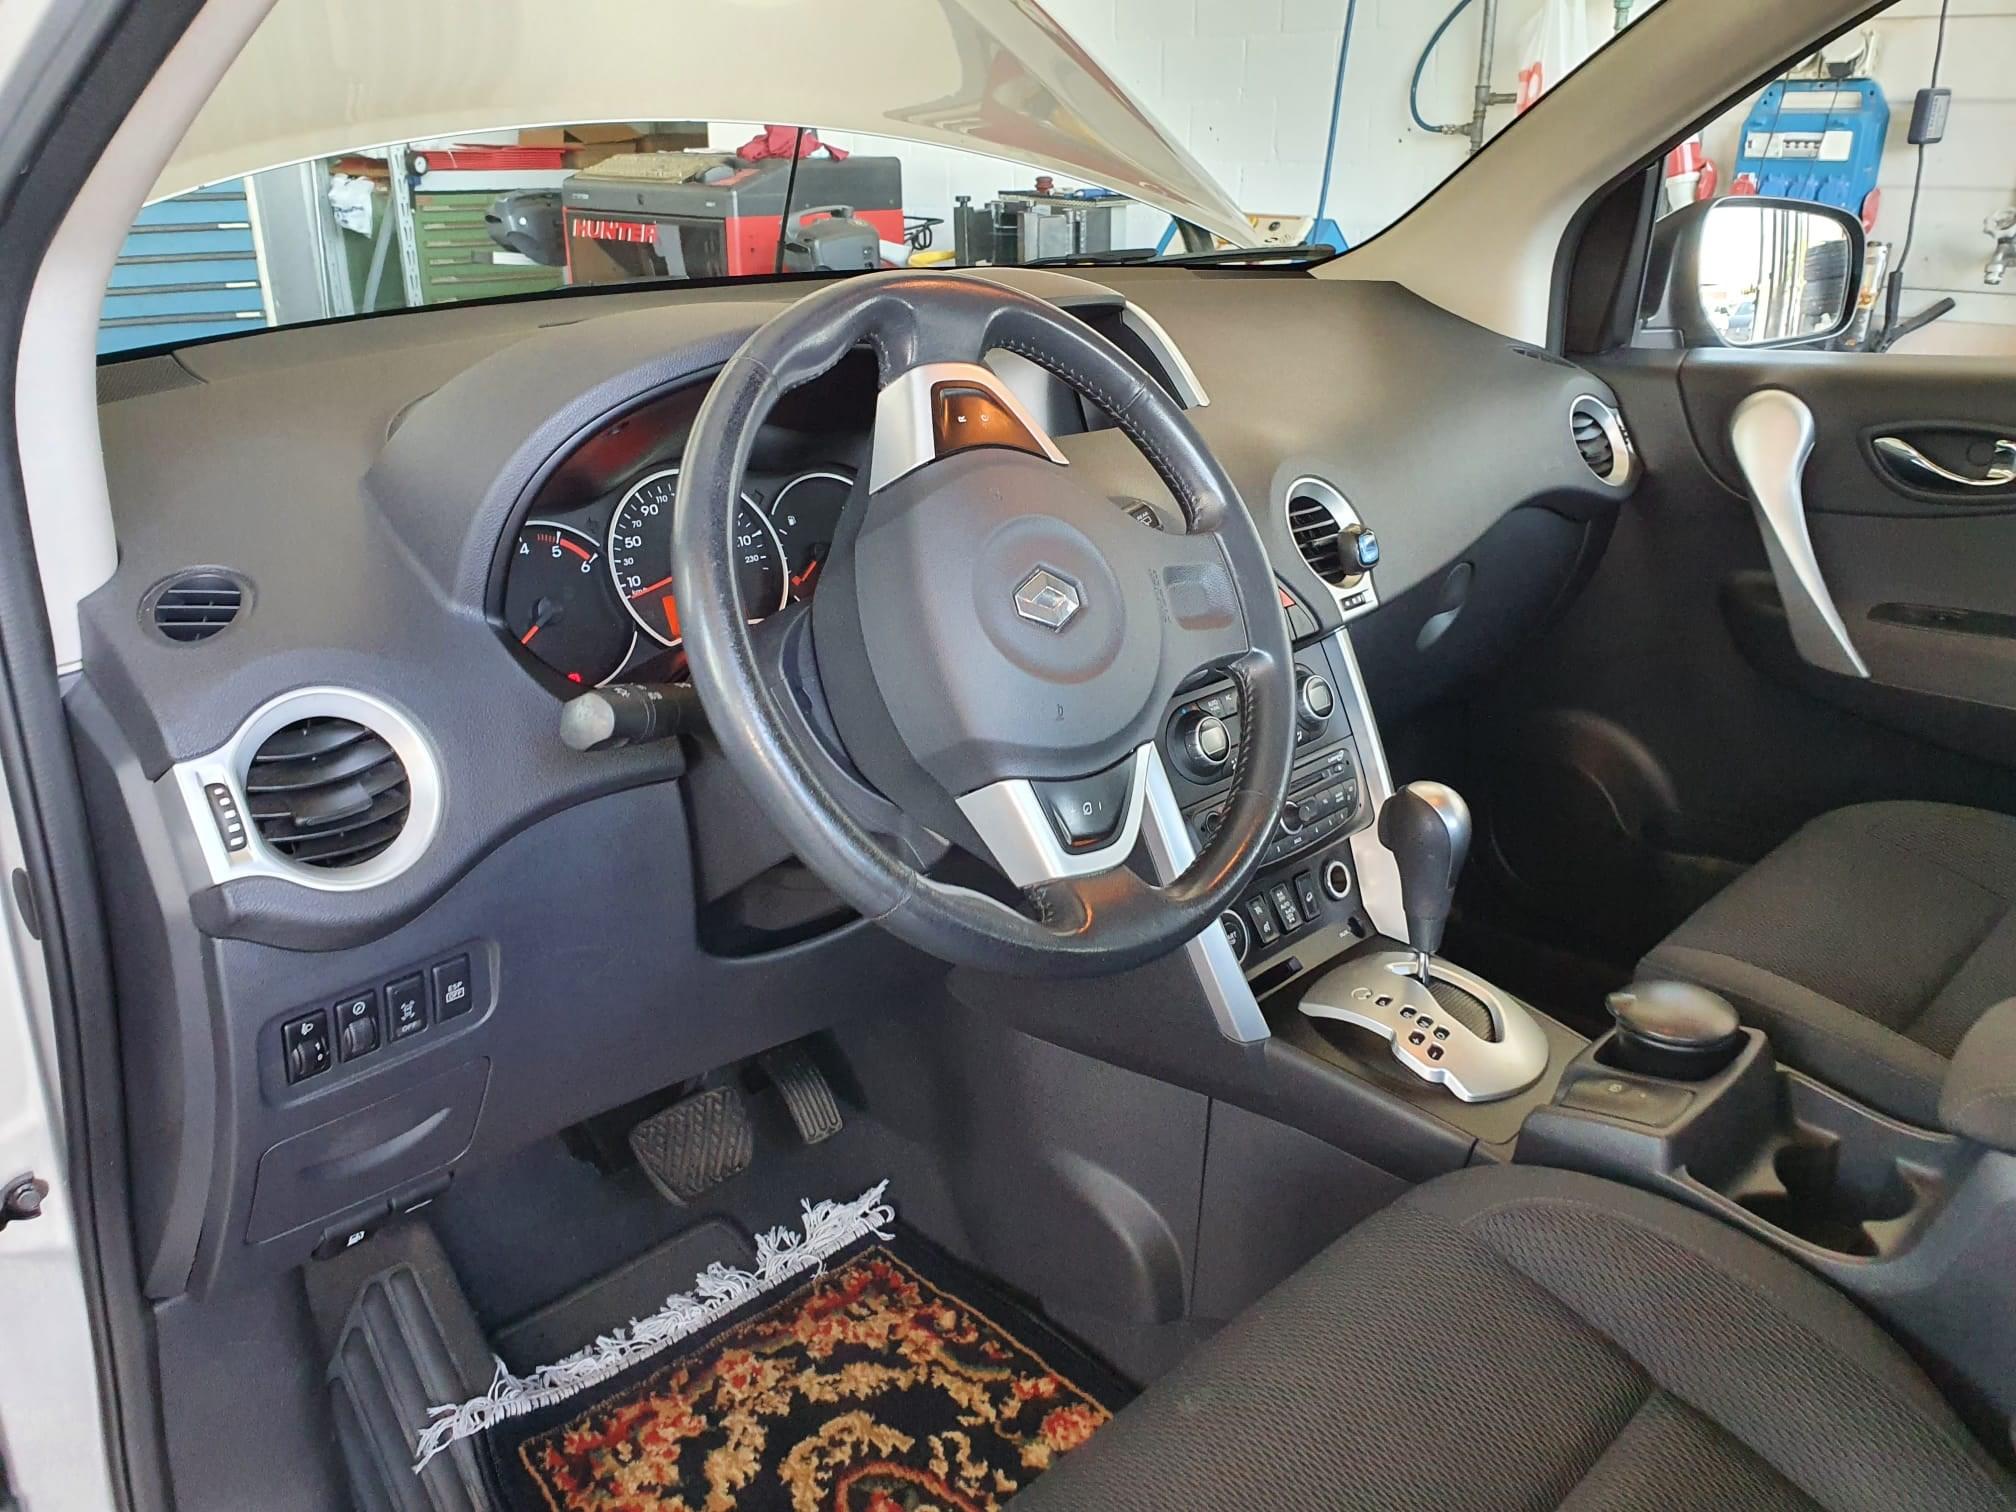 Renault Koleos 2.0dCi 150 4x4 Dynamique